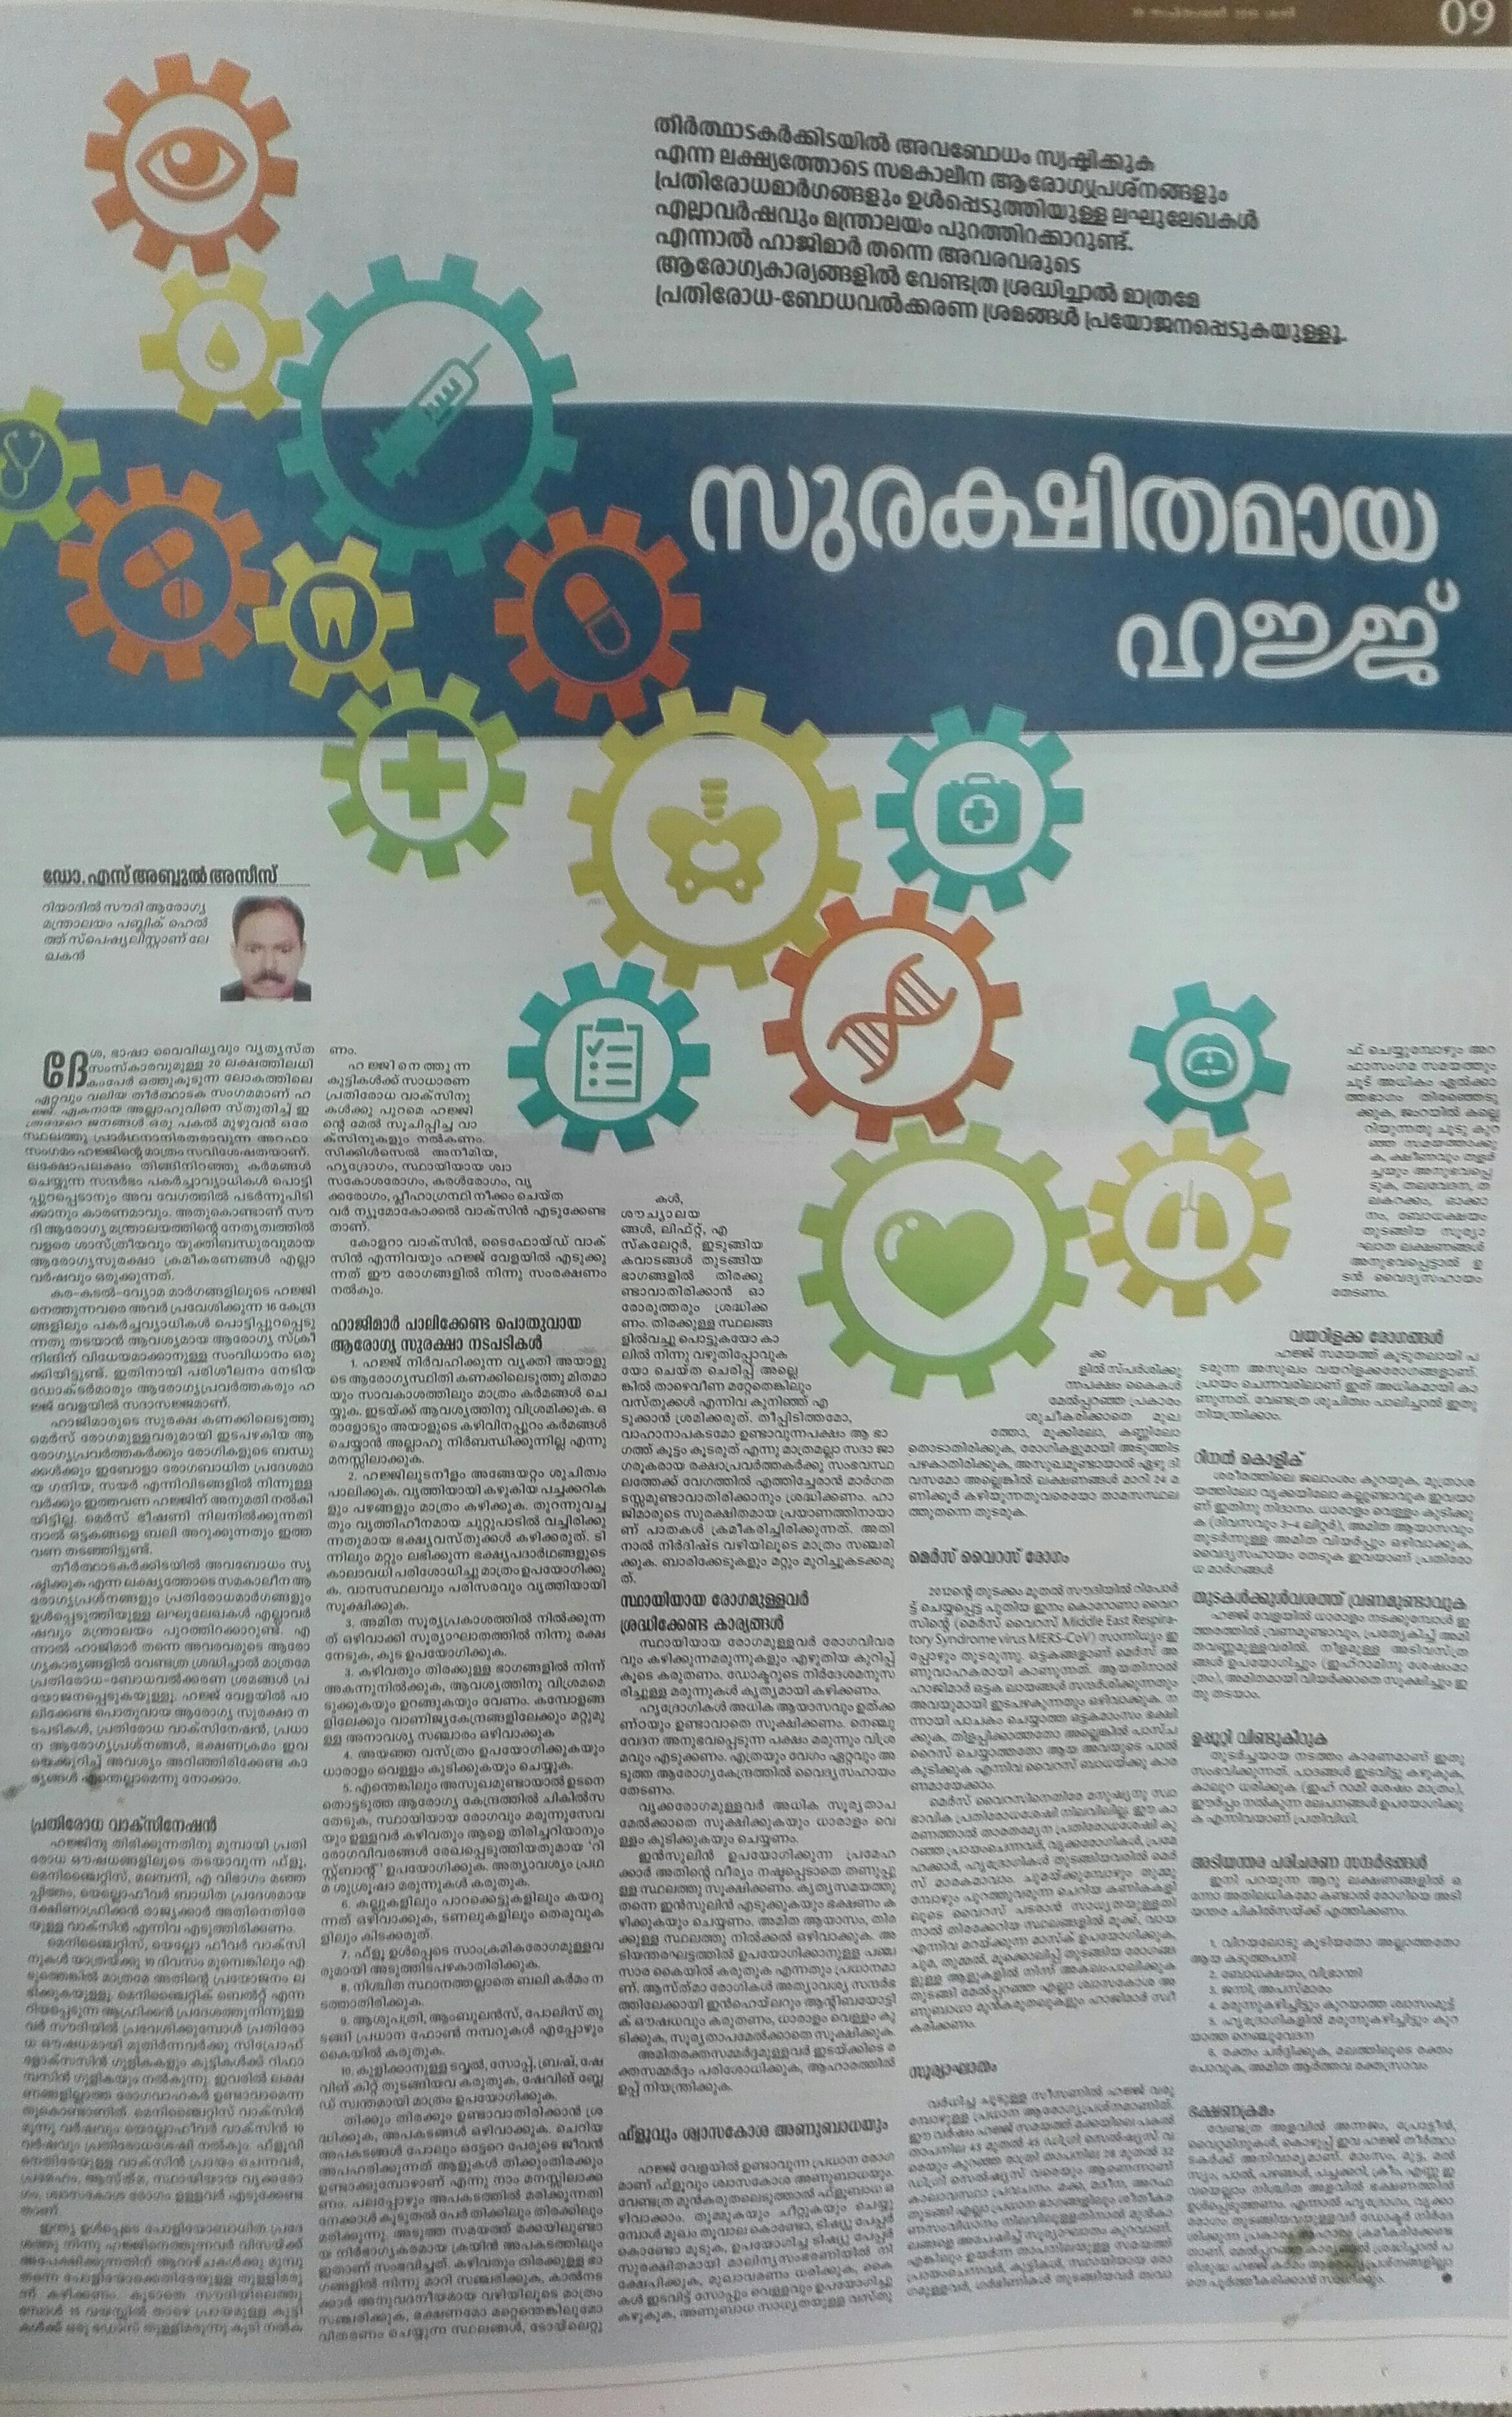 ARTICLE ON SAFE HAJJ - SUBAIR KUNJU FOUNDATION